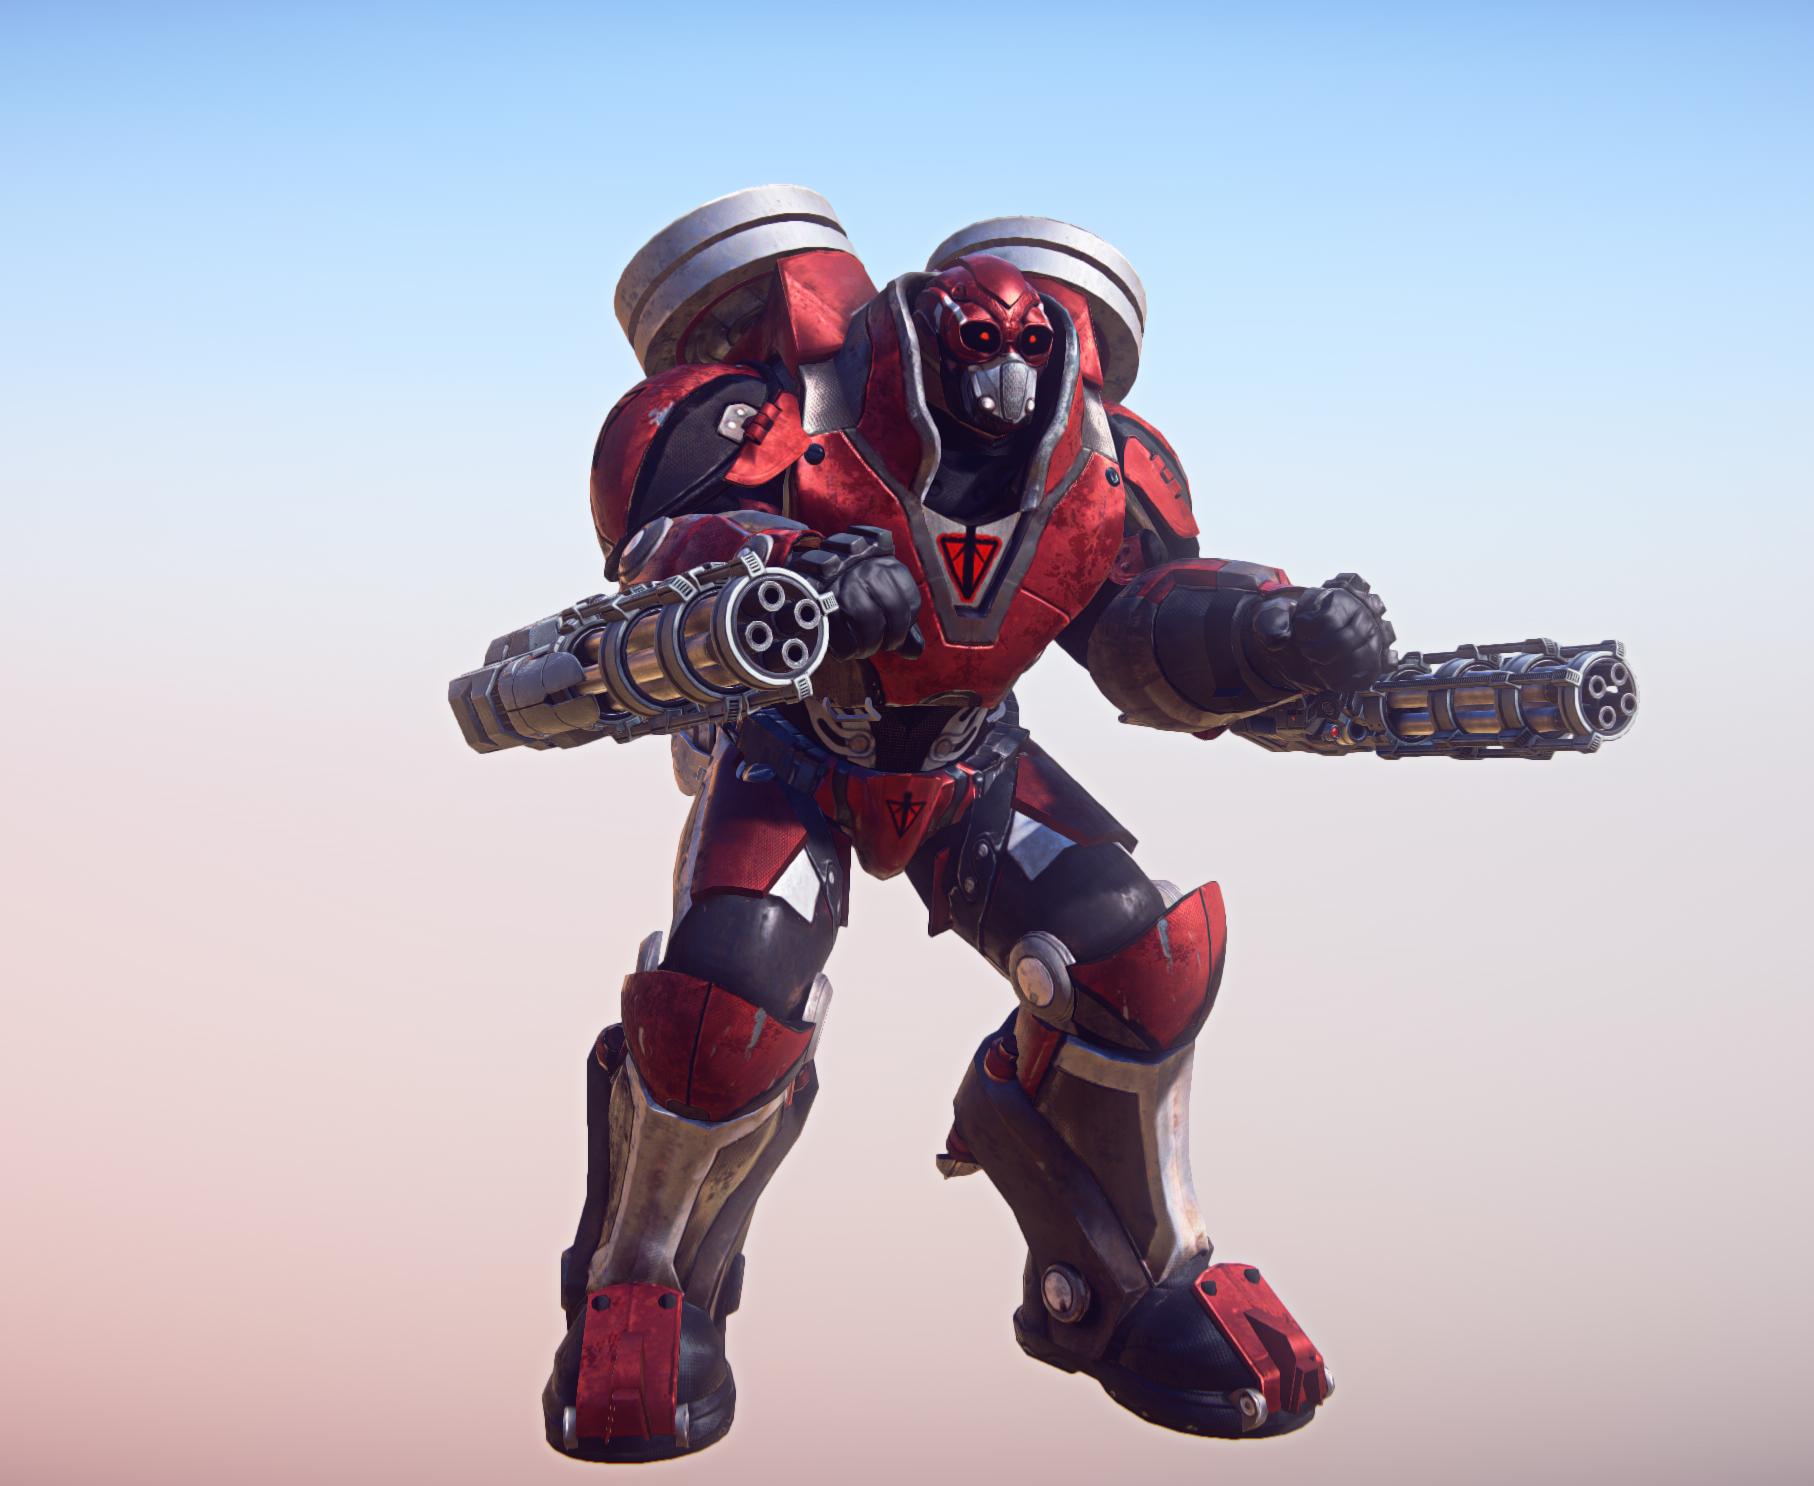 planetside-2-max-suit